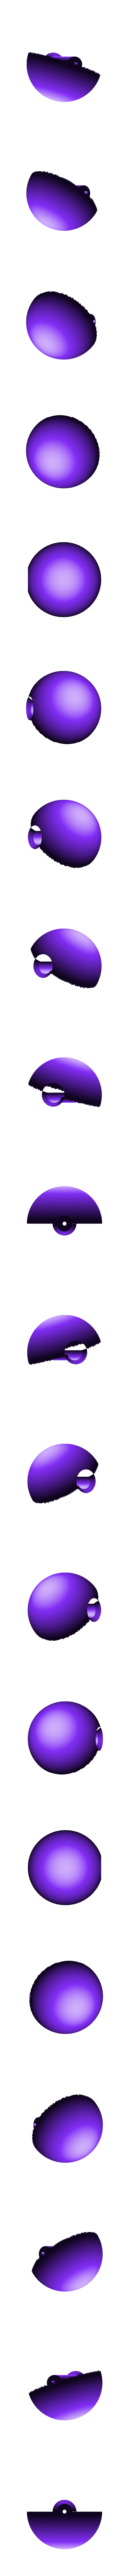 Kendama Ball.stl Download STL file Classic Kendama • 3D printing design, httpkoopa